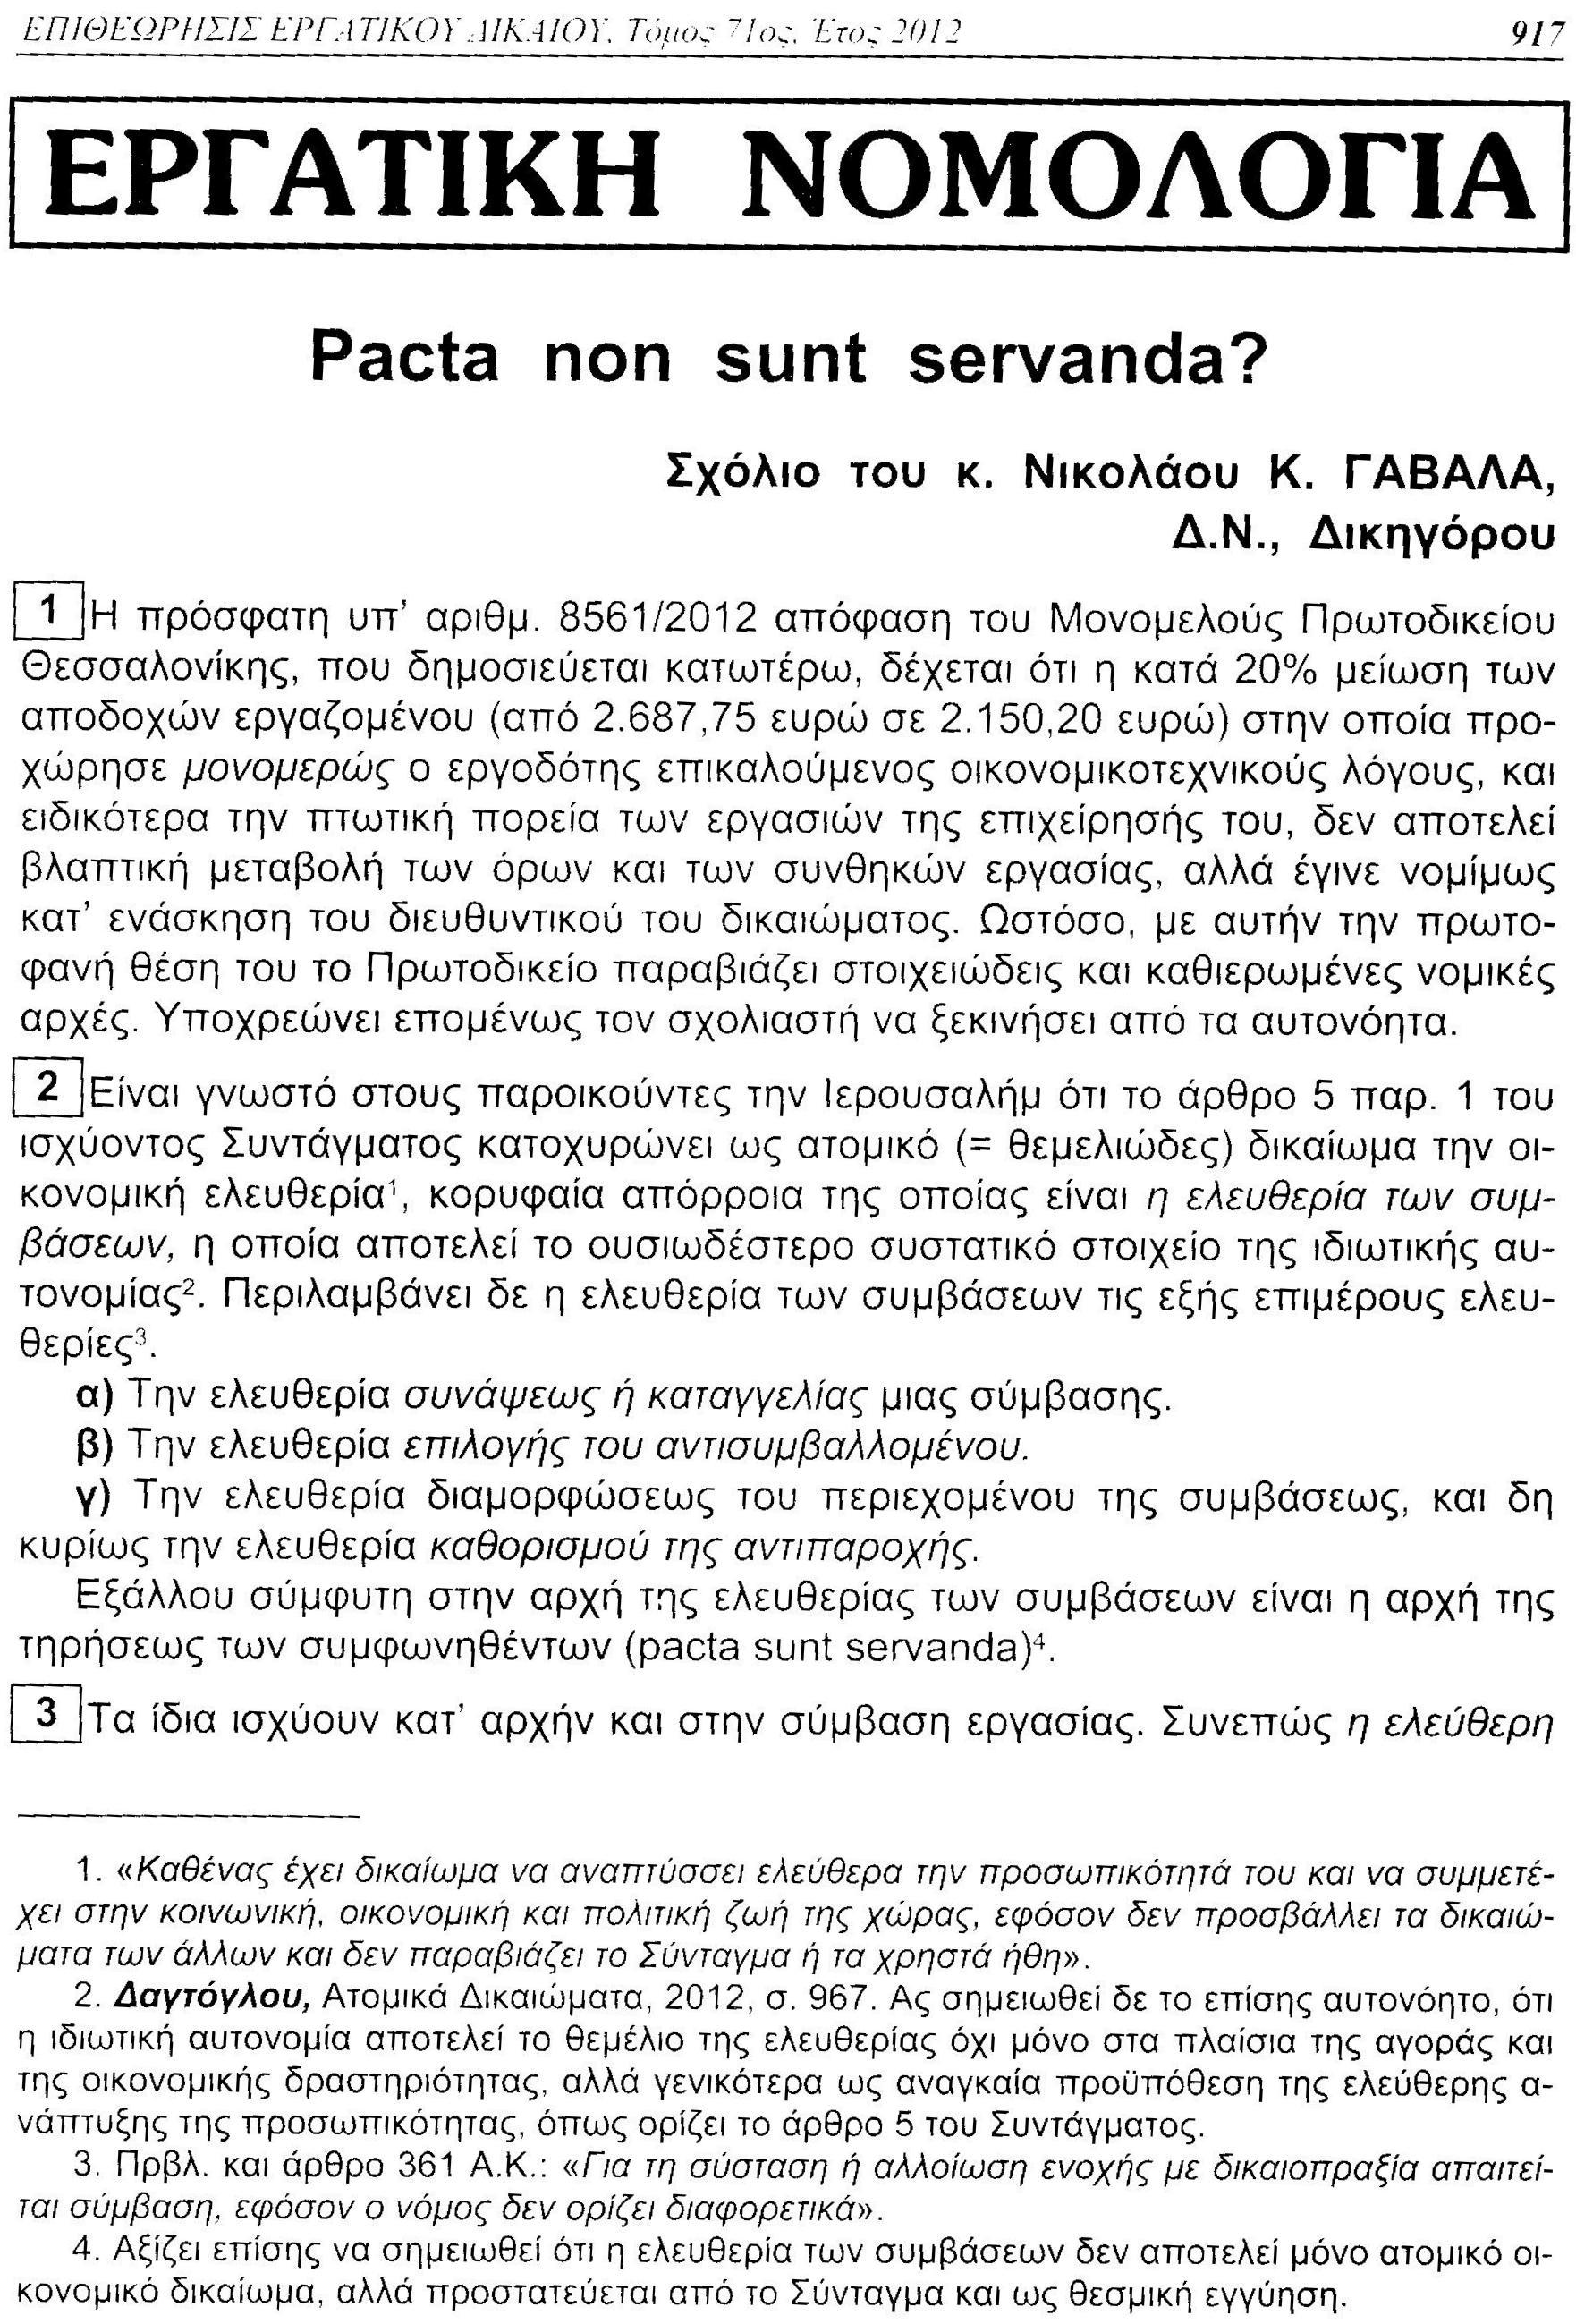 Gavalasp1